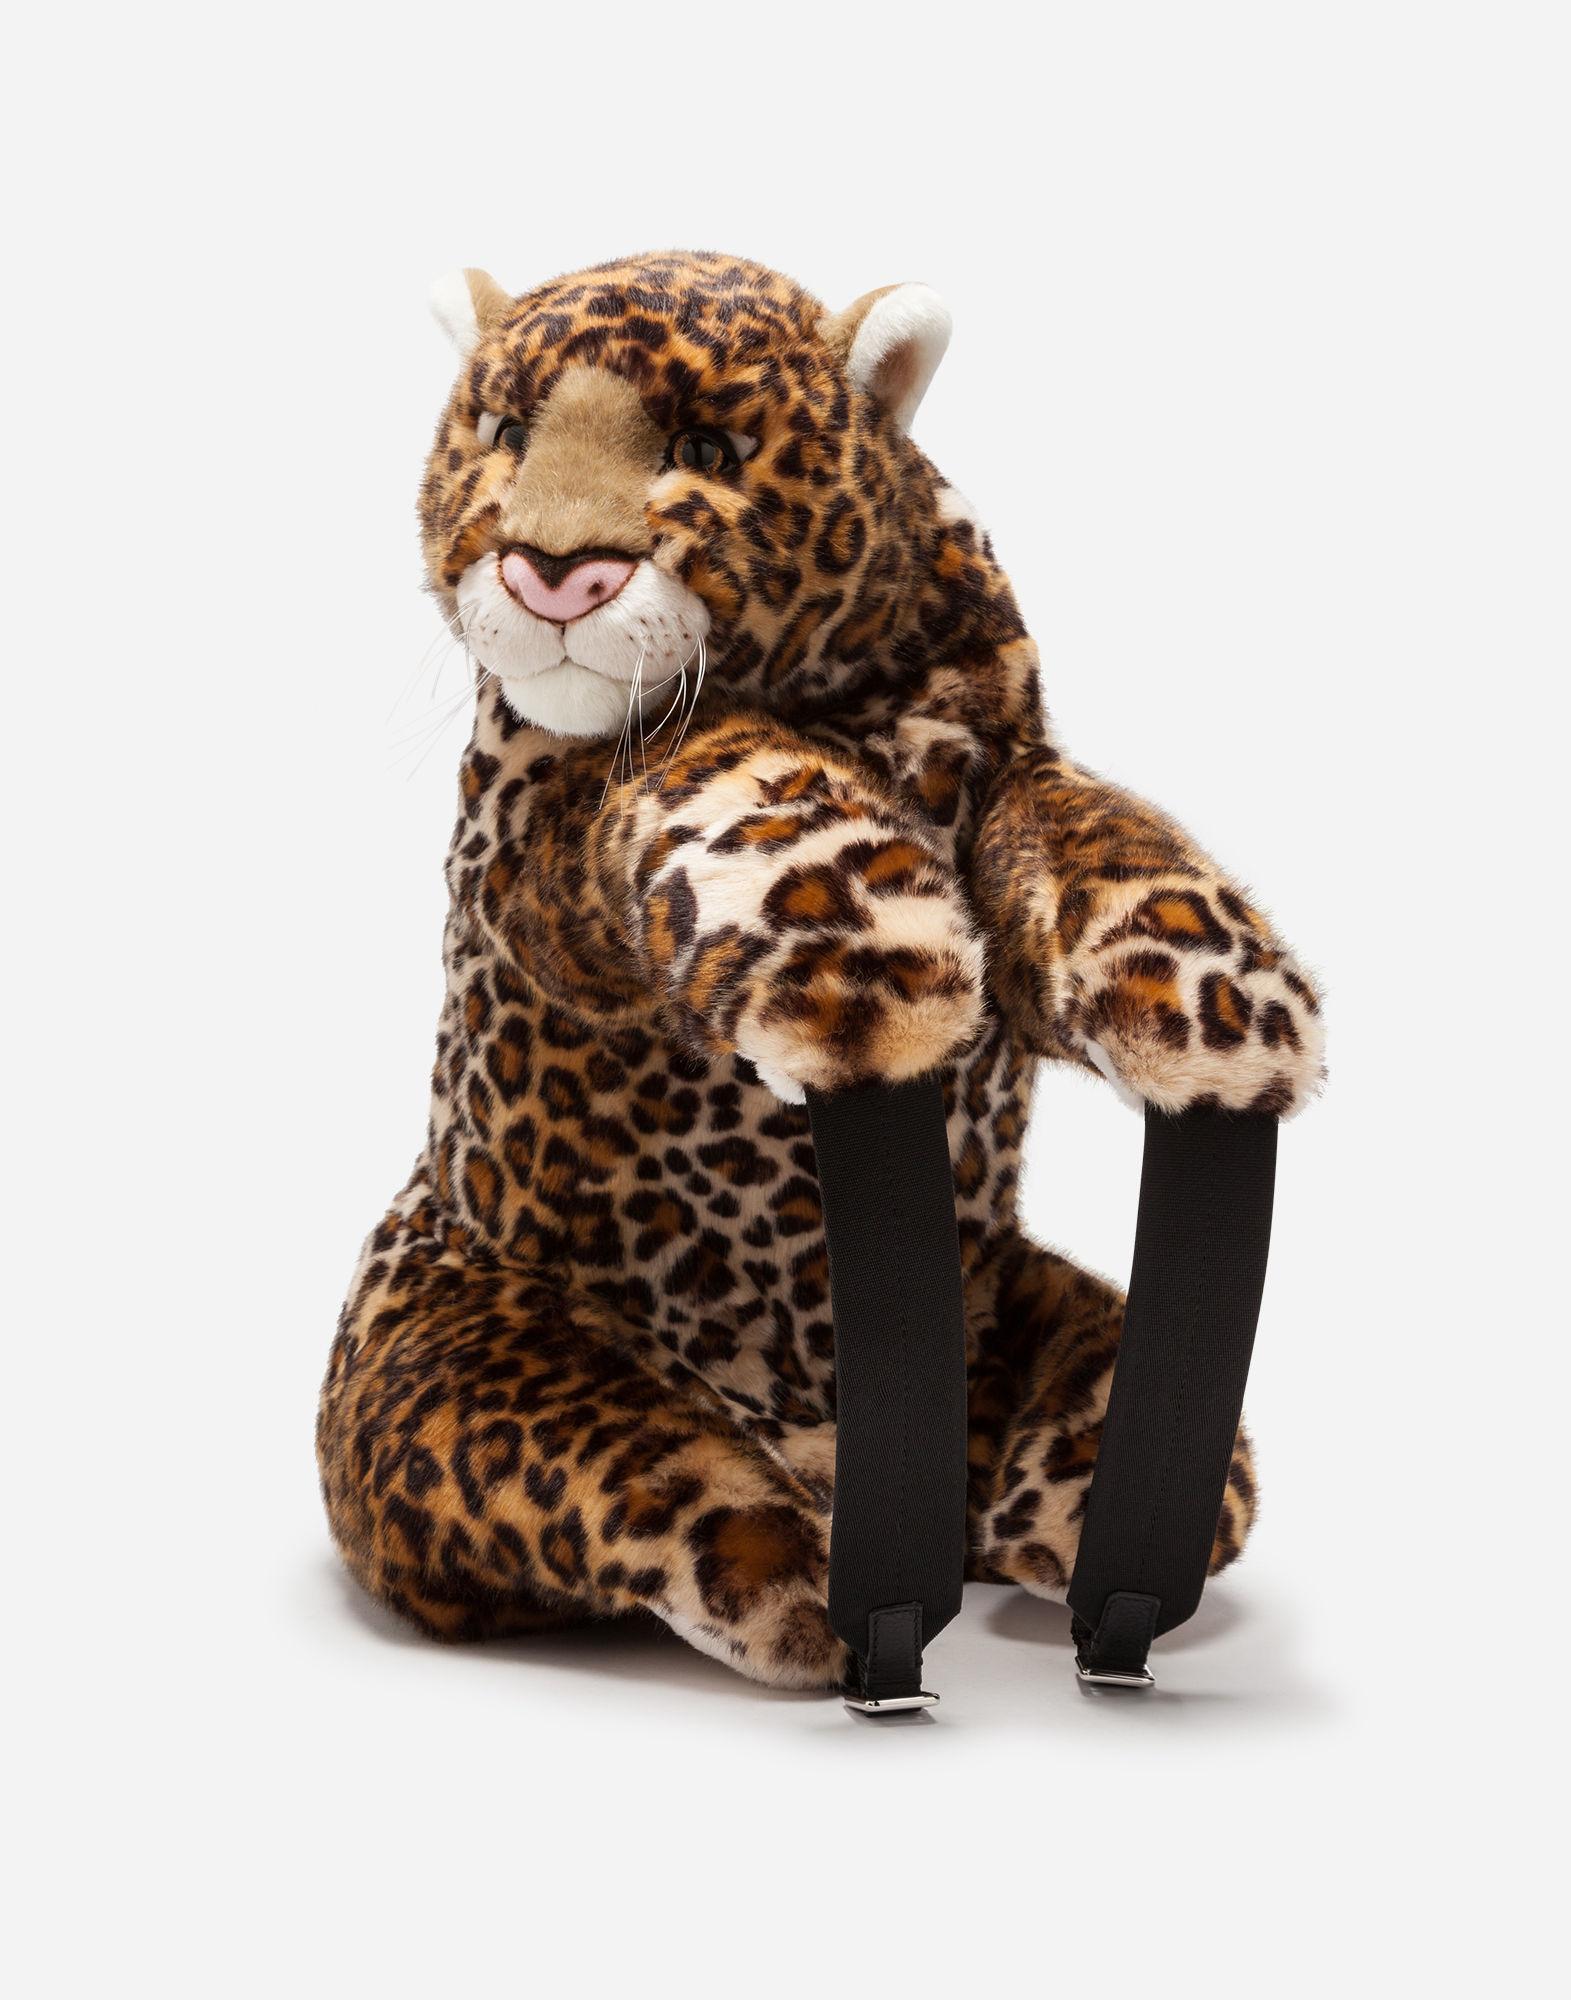 Dolce & Gabbana Leopard Stuffed Toy Backpack In Neutrals